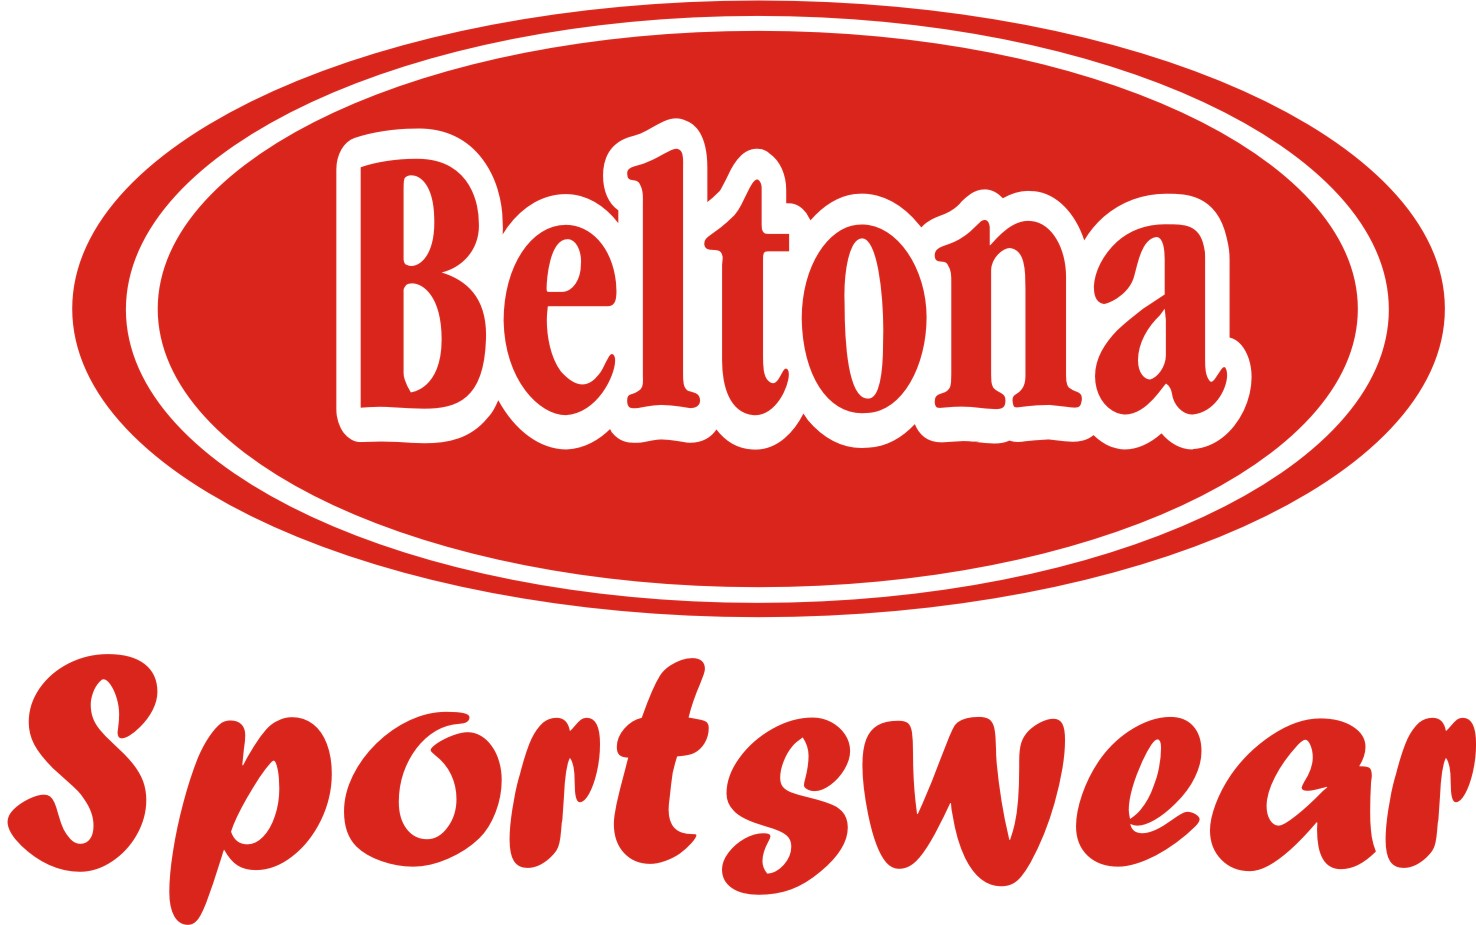 beltona-sportsw.